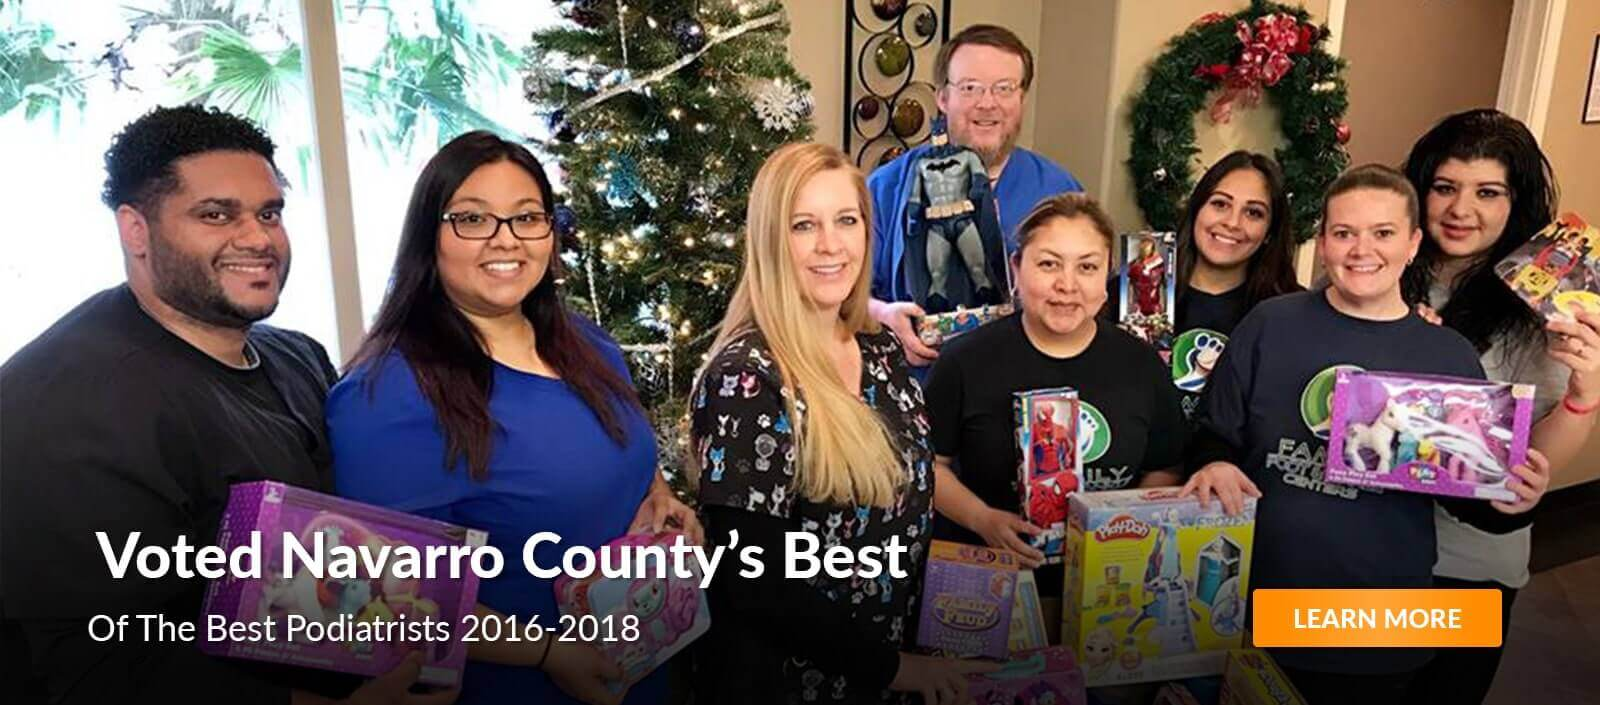 navarro county's best podiatrist